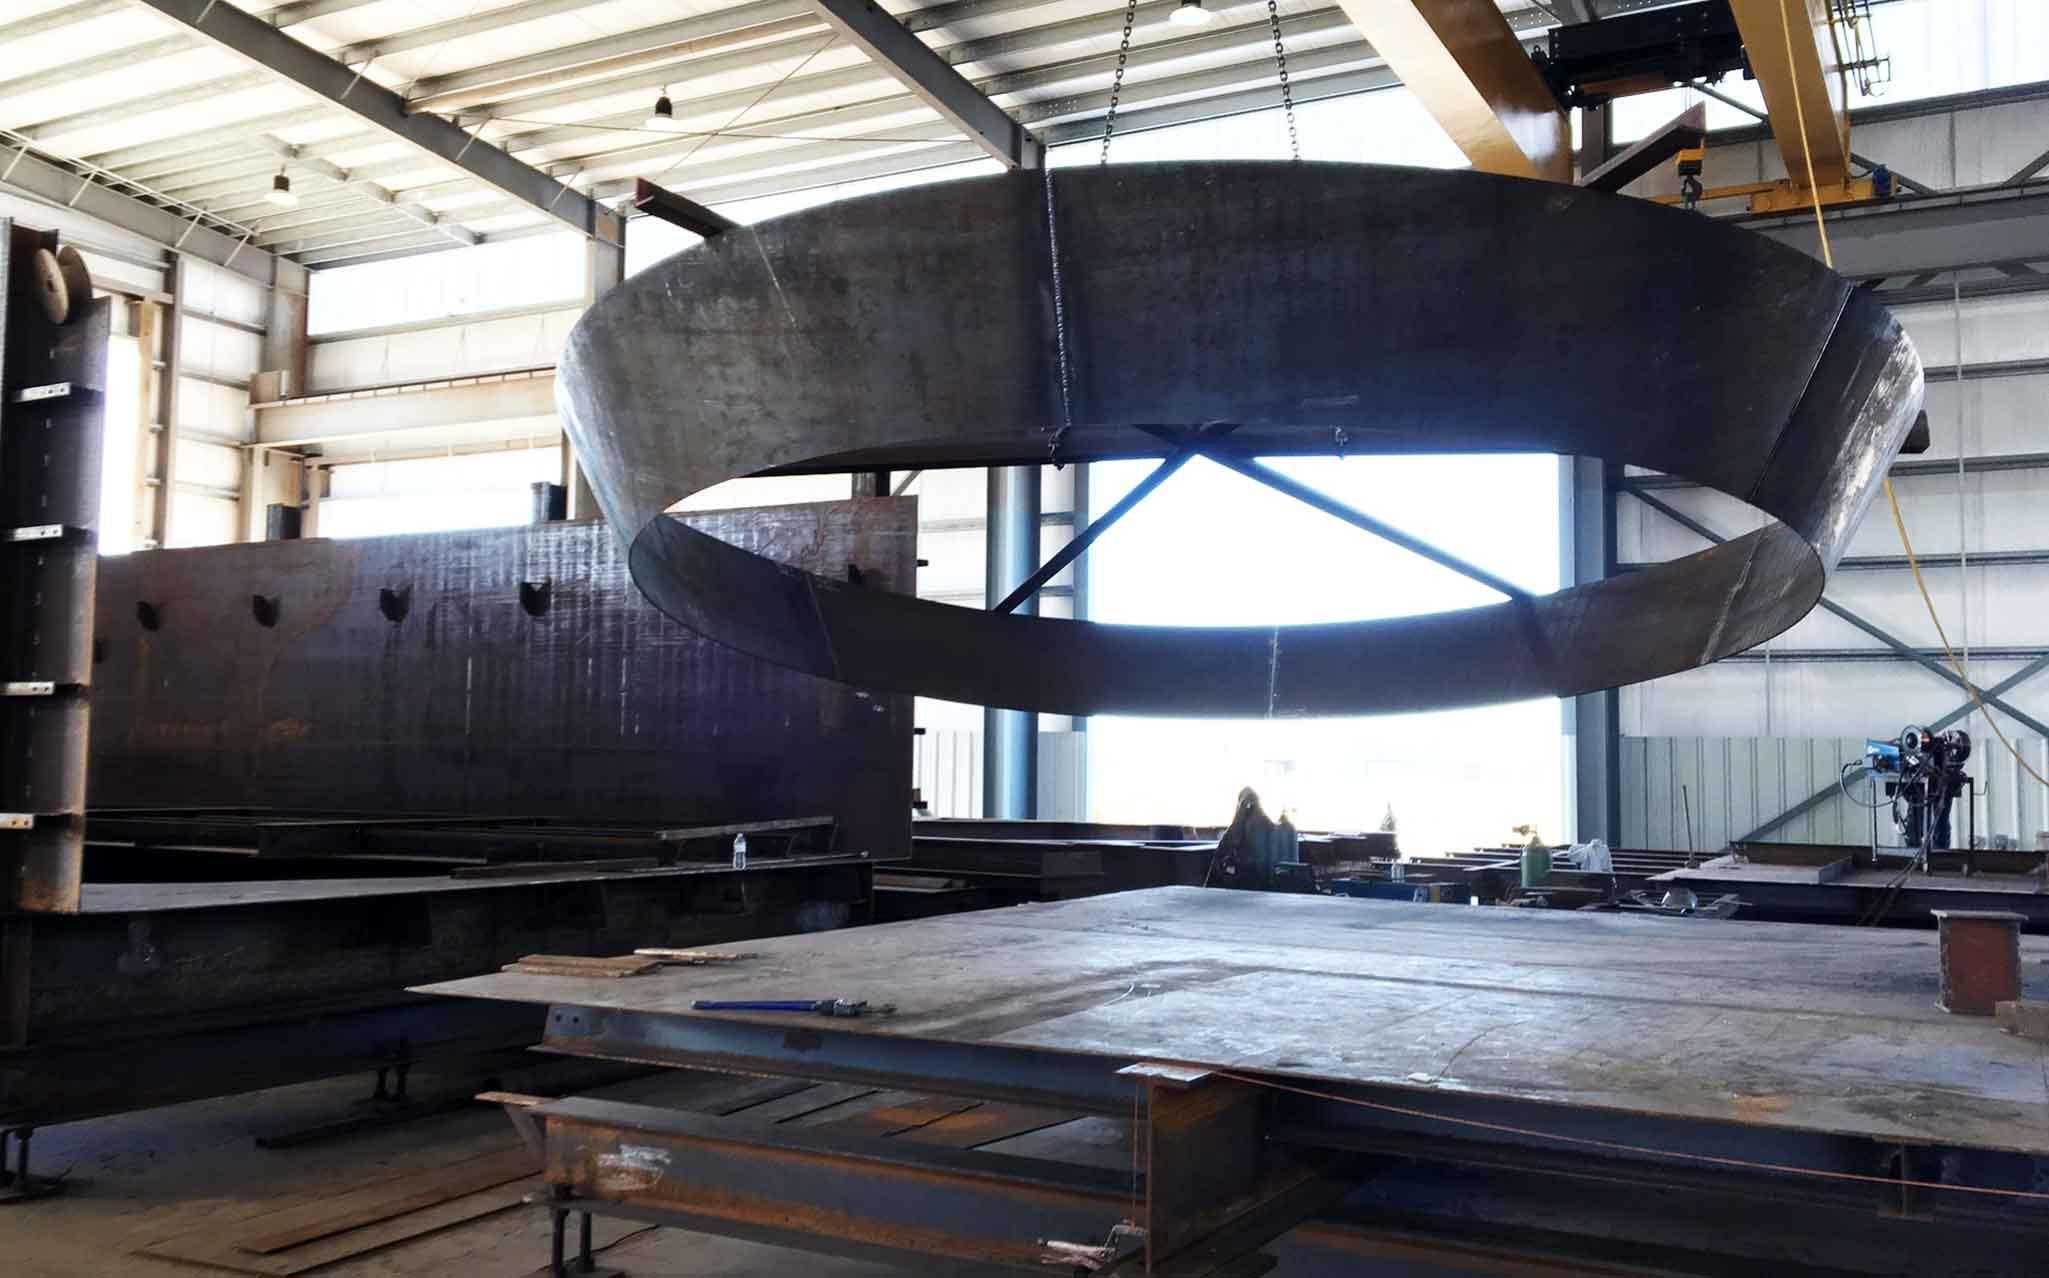 Plate Fabrication